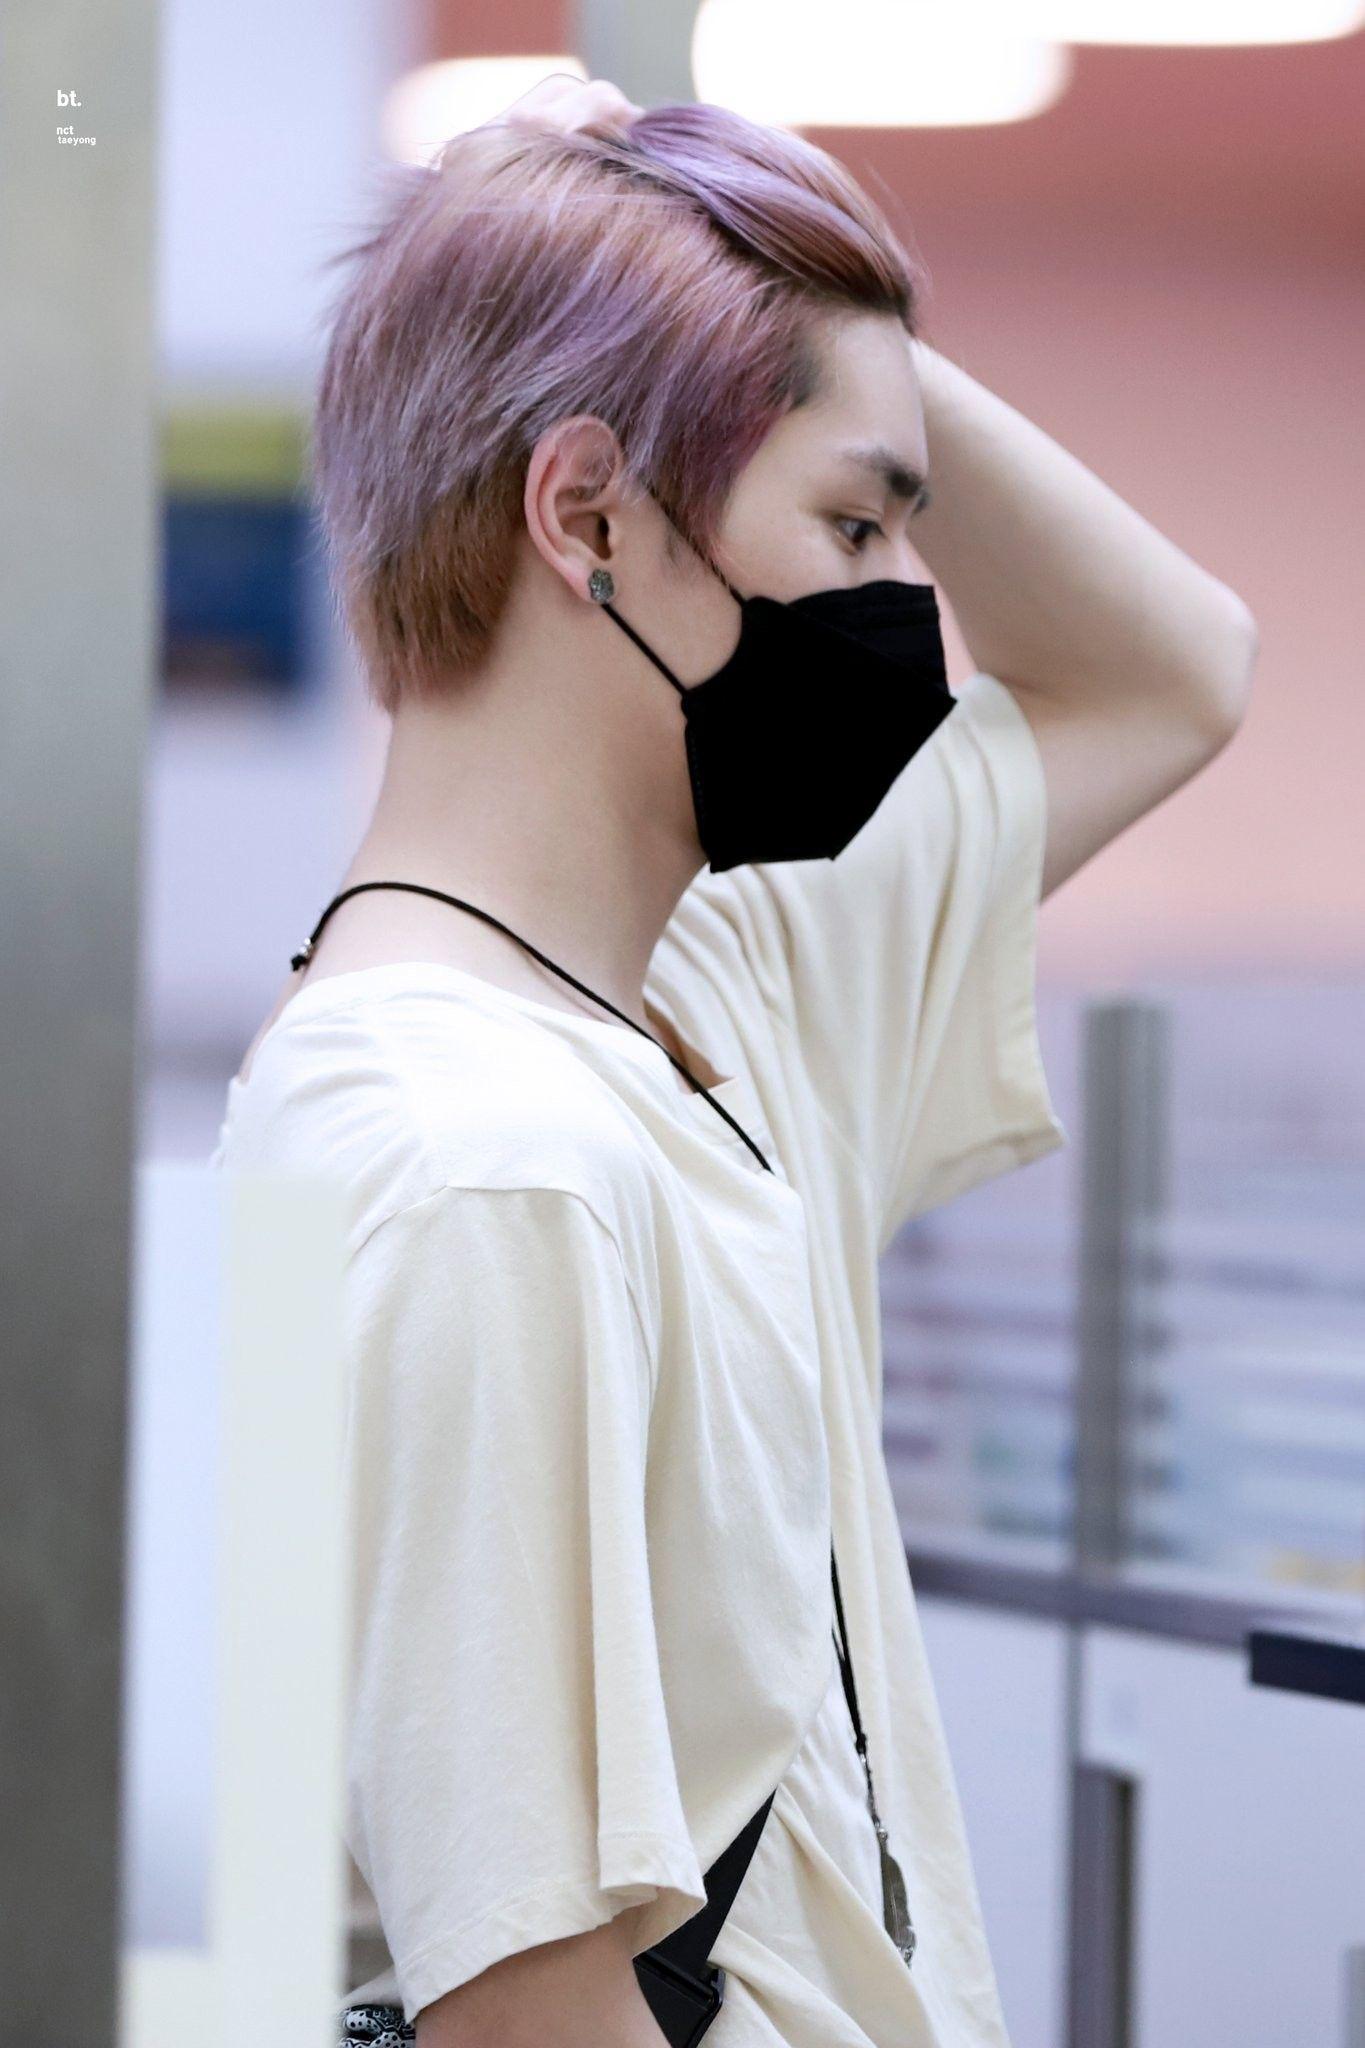 HND 태용 TAEYONG NCT127 (Dengan gambar) Foto sahabat